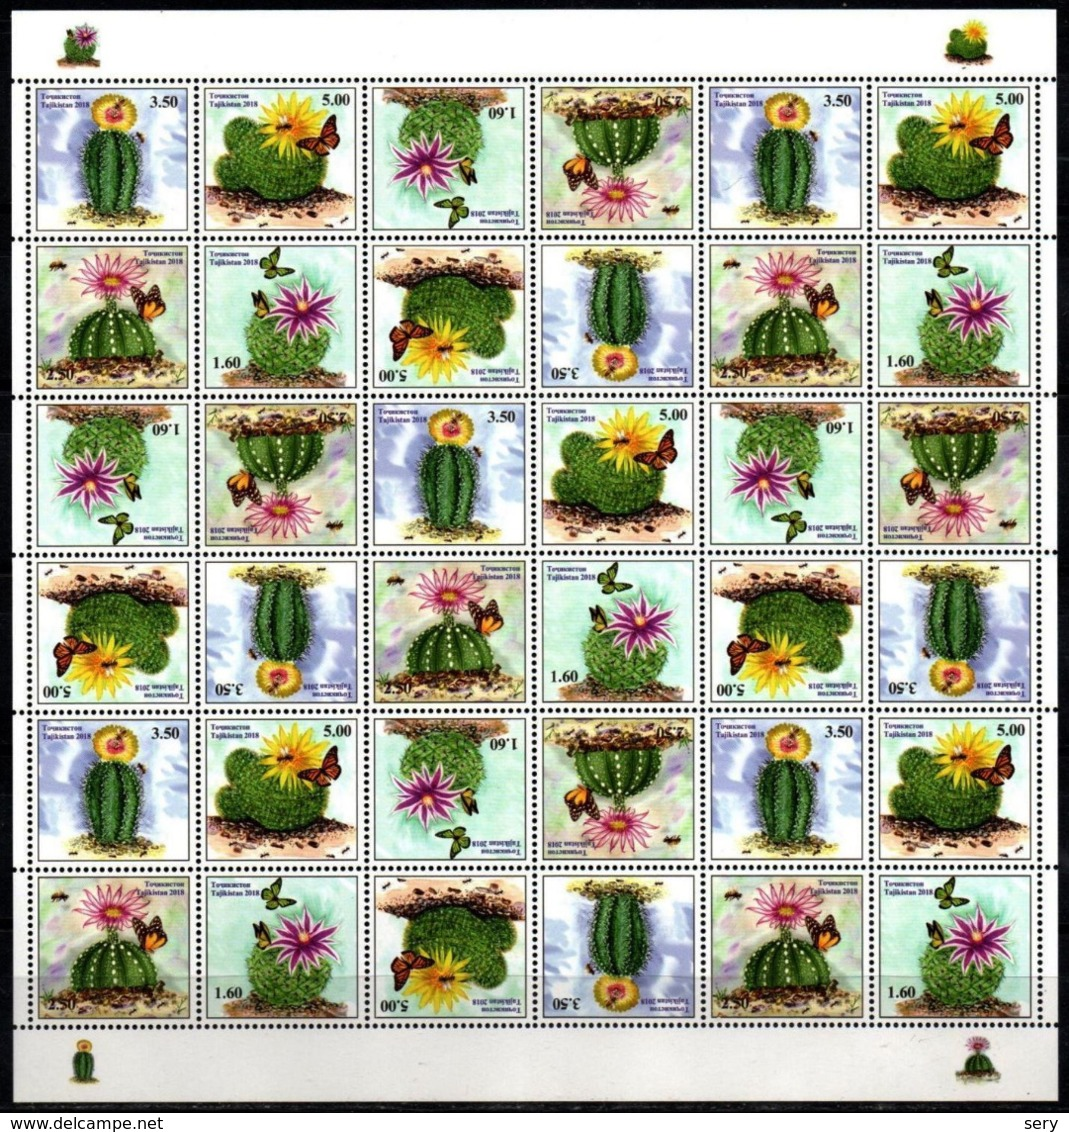 Tajikistan 2018 Full Sheet MNH Cactuses Cactus Flowers Flower Fleurs Fleur - Cactus